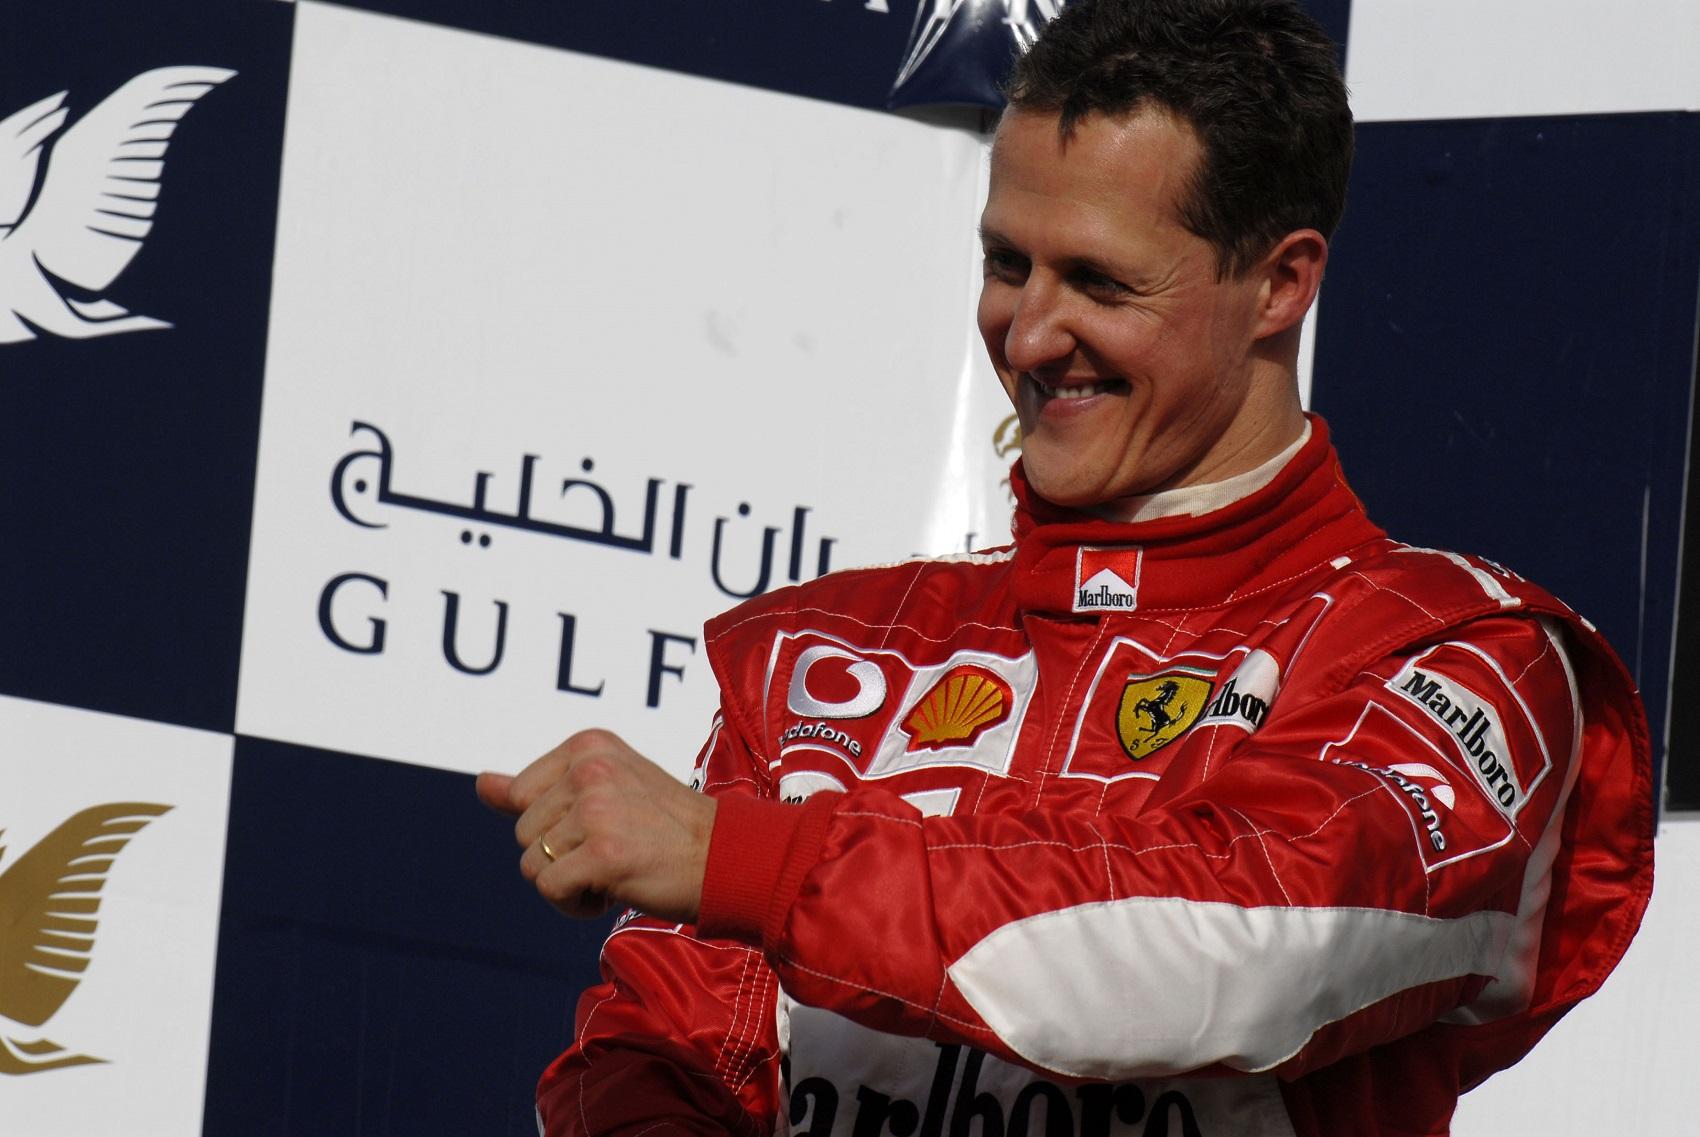 Michael Schumacher racingline.hu, racingline, racinglinehu